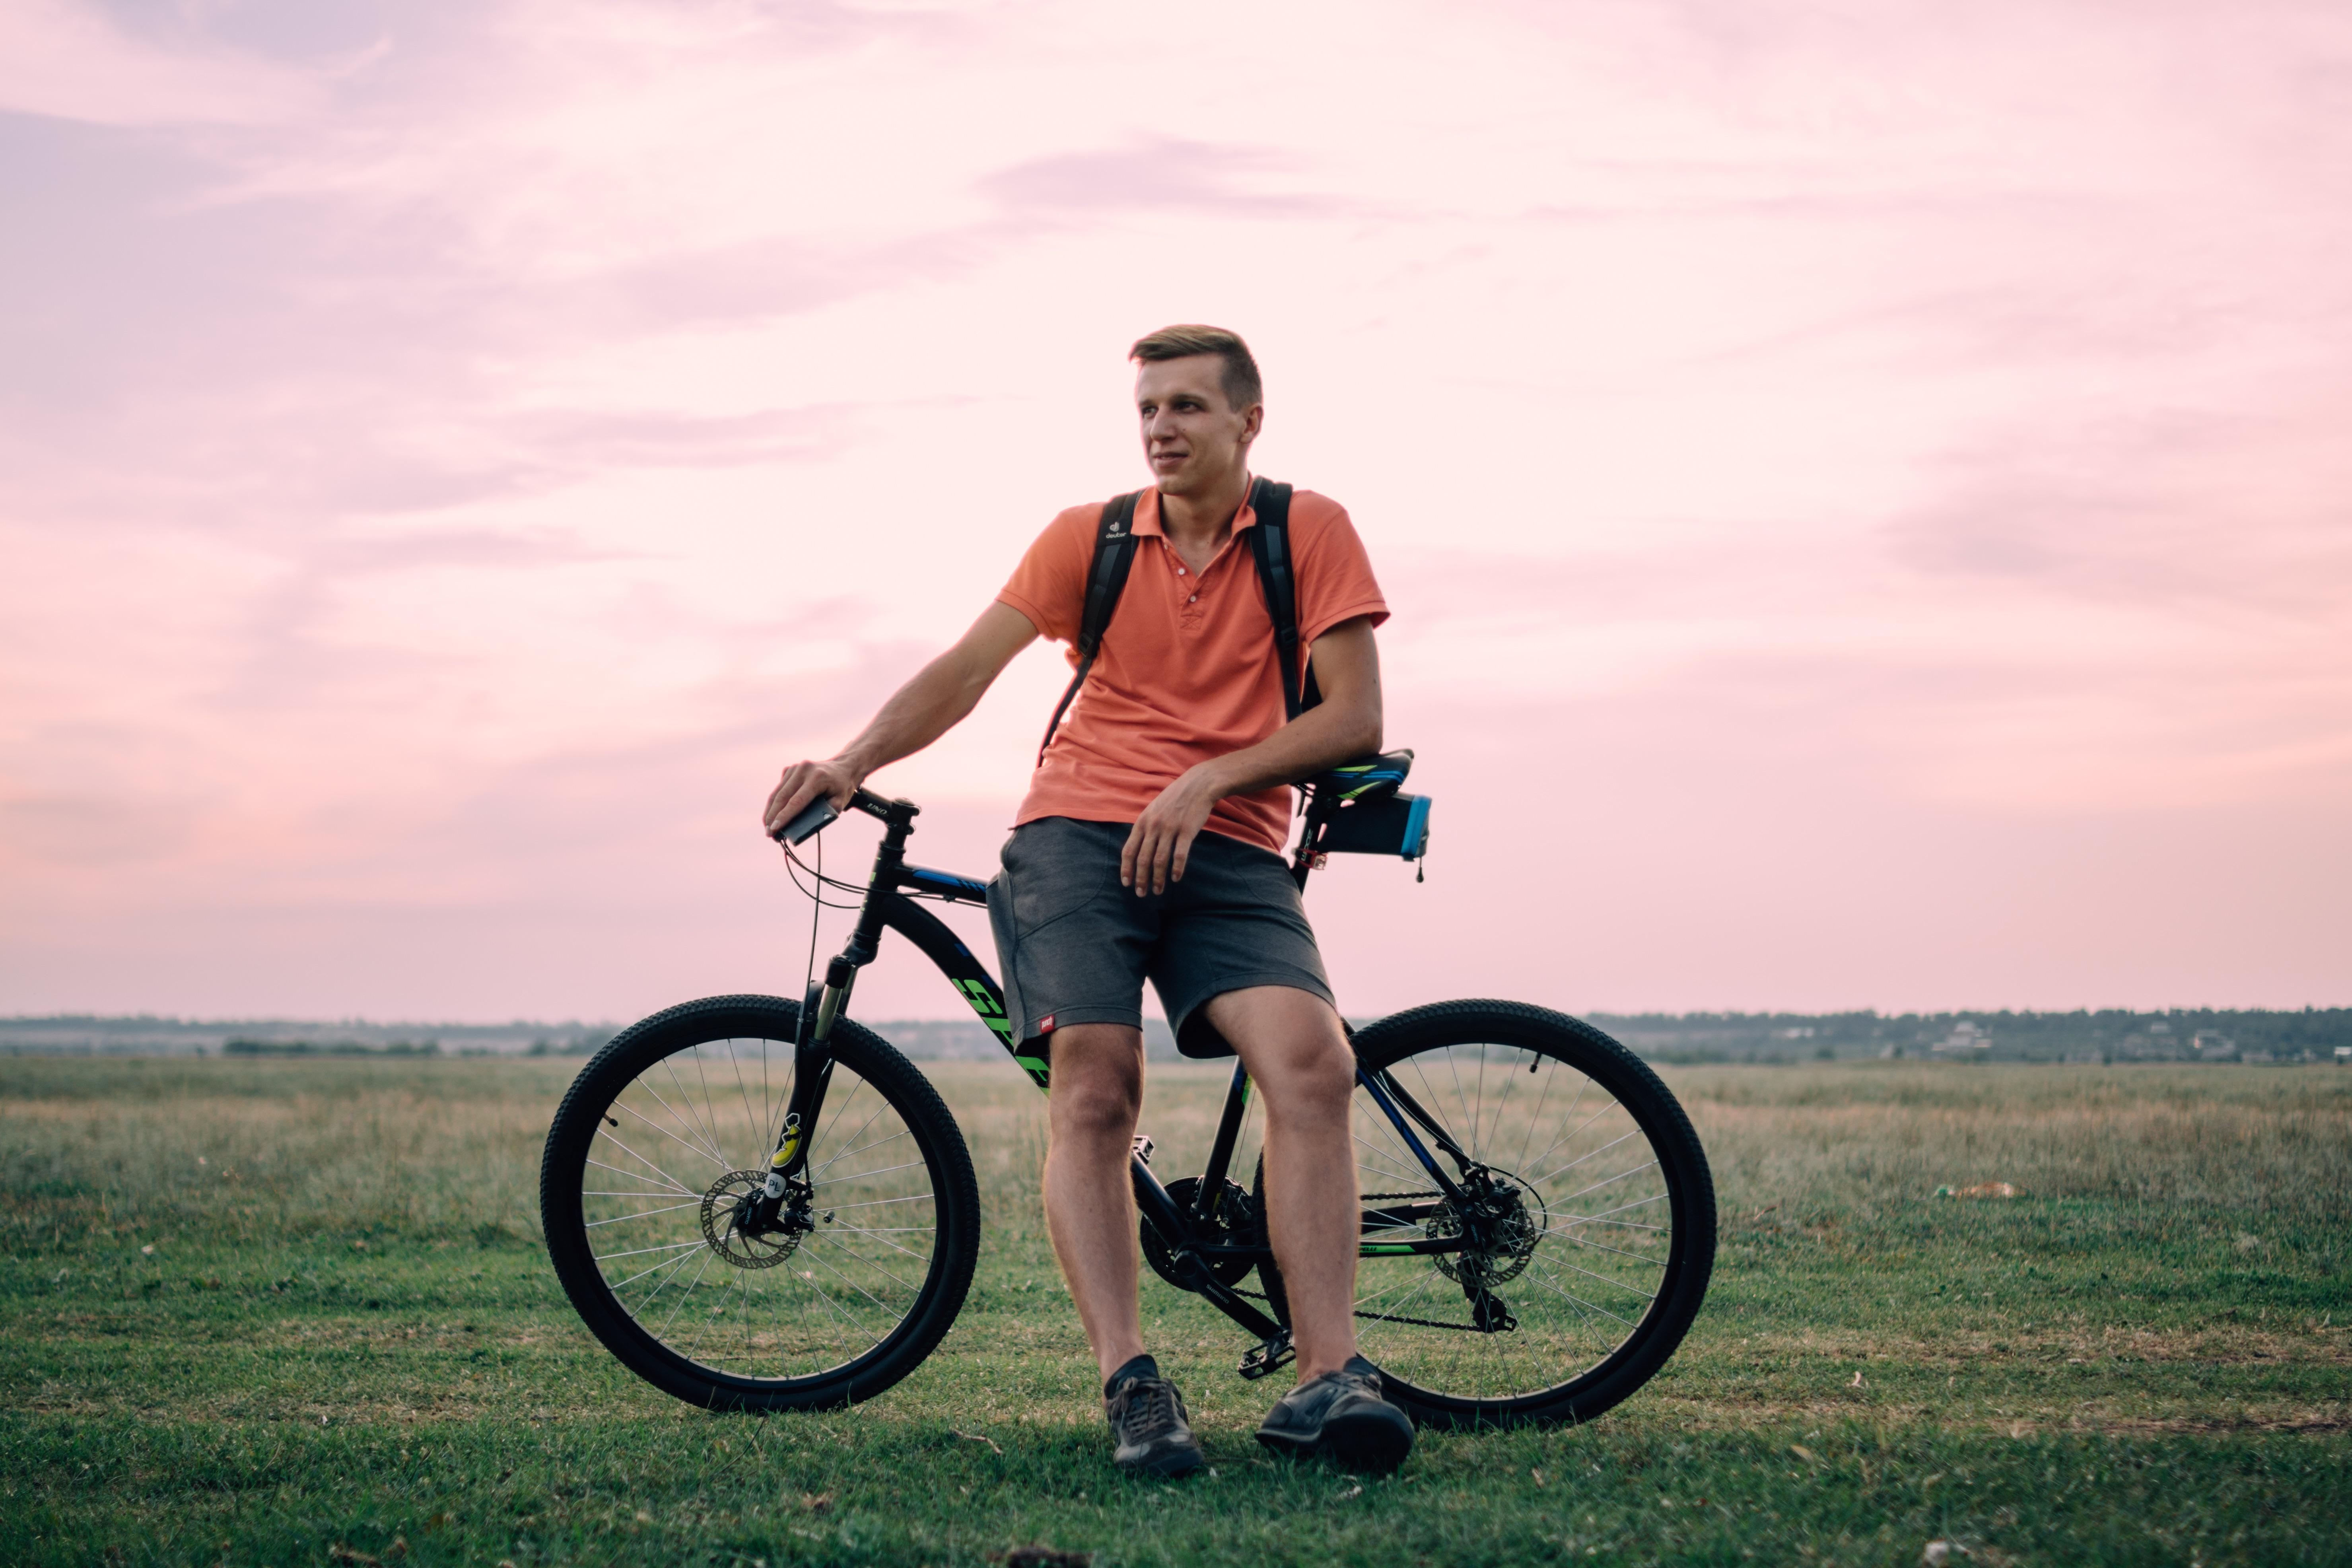 чин фото мужчина на велосипеде около лед